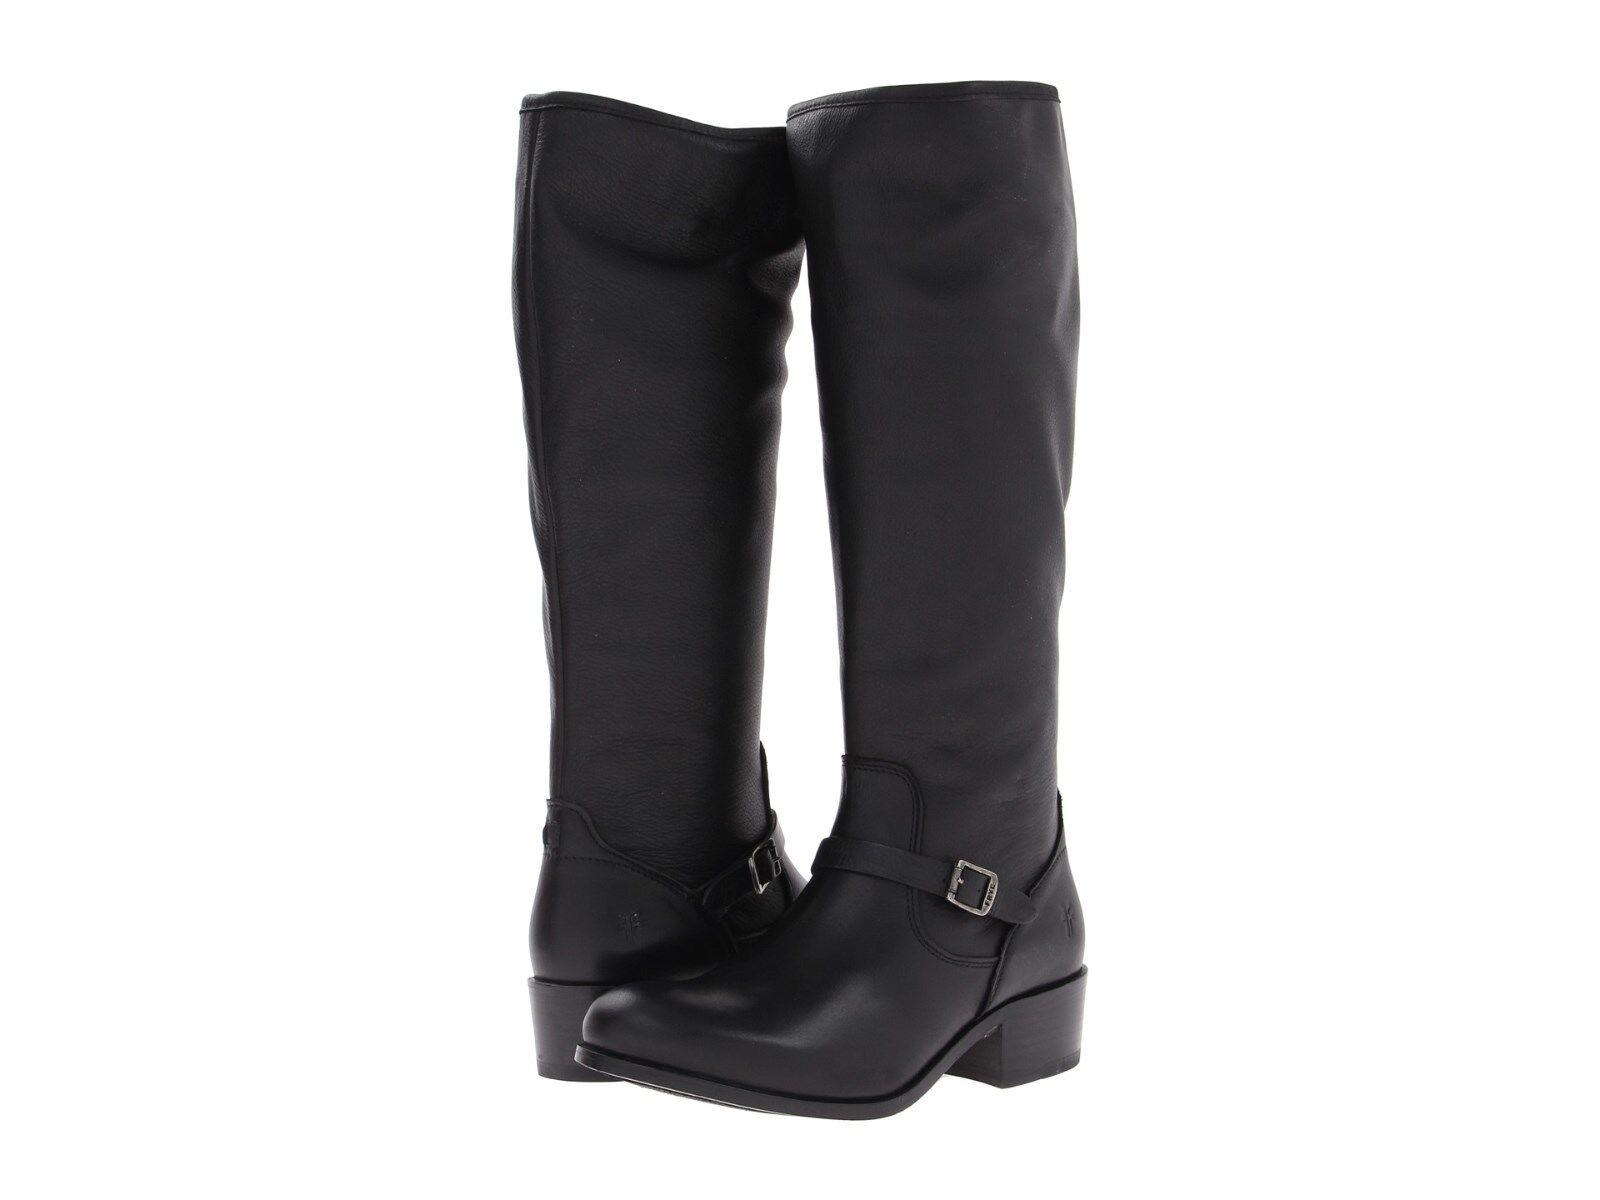 Women's Frye Boots Lynn Strap Tall ZipOn Riding Boot Black 76105 BLK